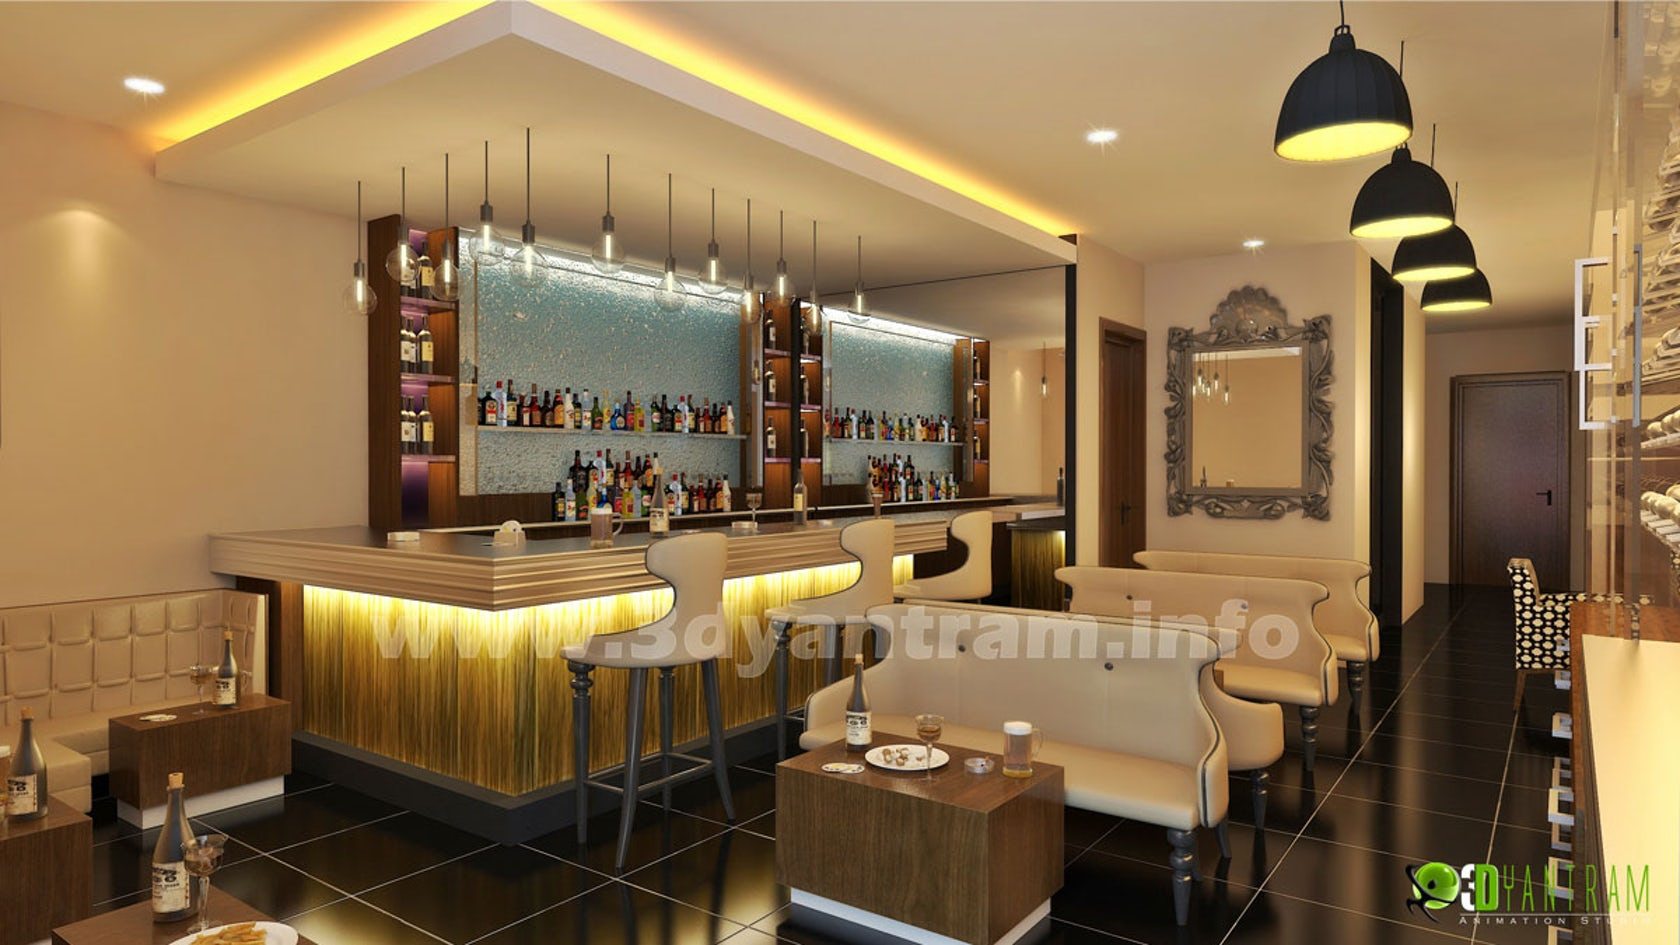 Bar - Restaurant 3D Interior Design - Architizer